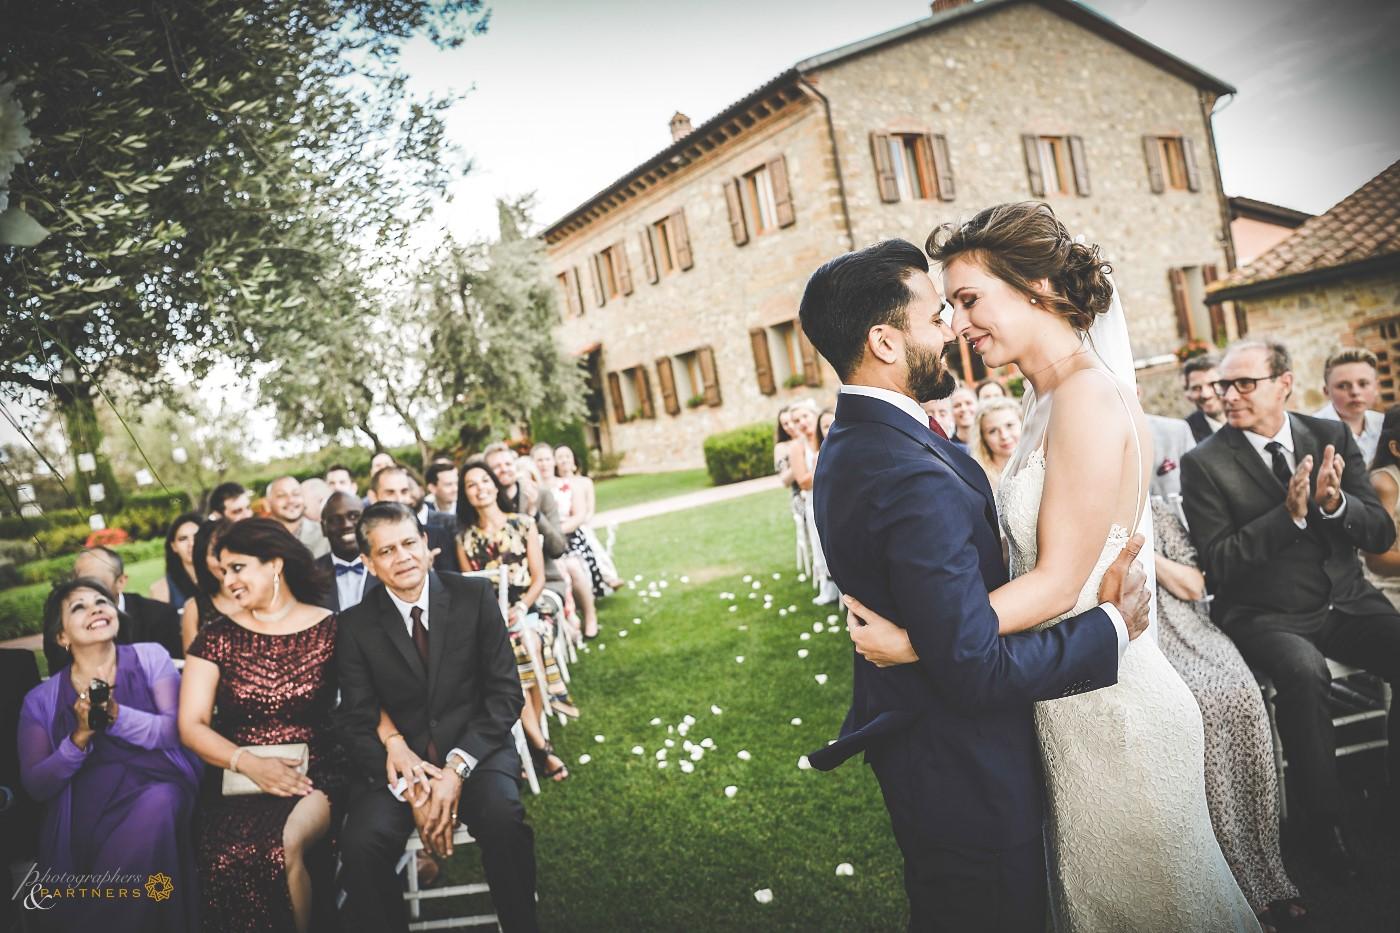 wedding_photos_tenuta_quadrifoglio_08.jpg